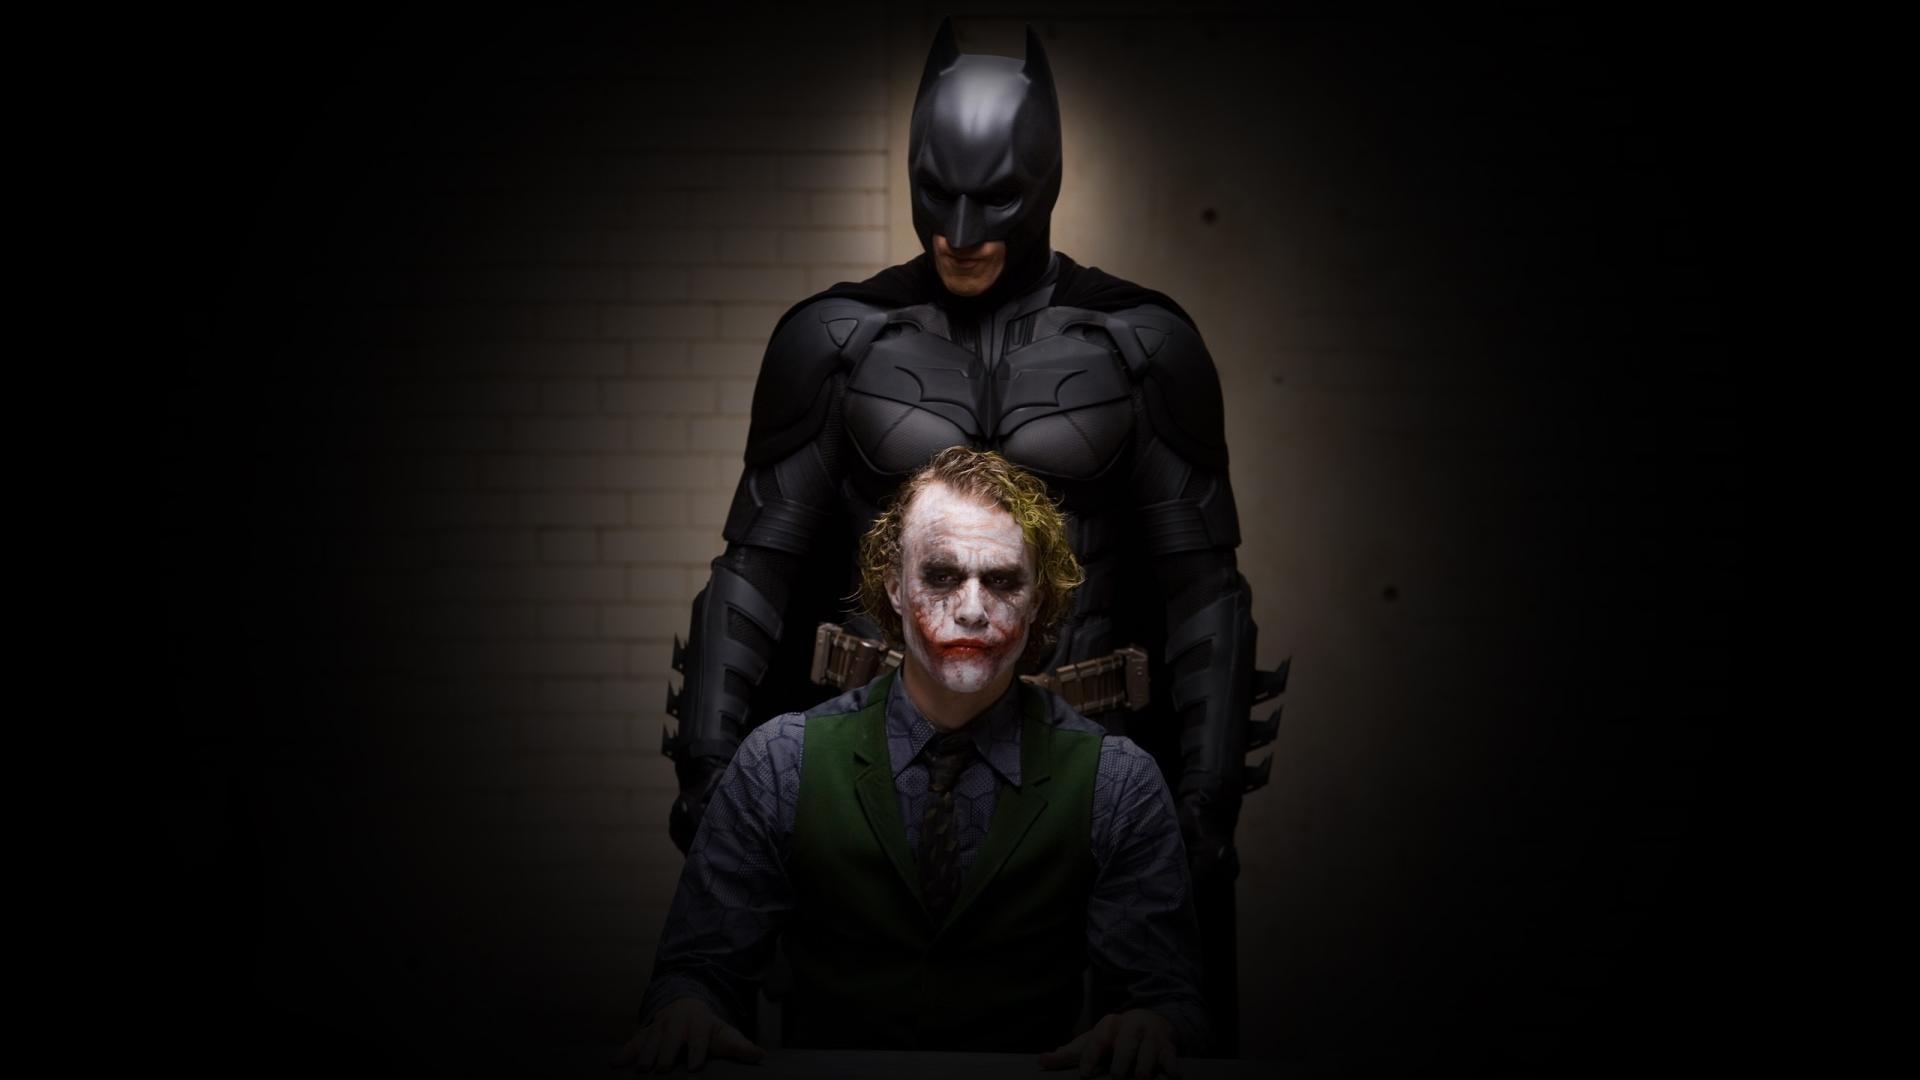 Batman Joker Dark Knight Wallpaper Images amp Pictures   Becuo 1920x1080